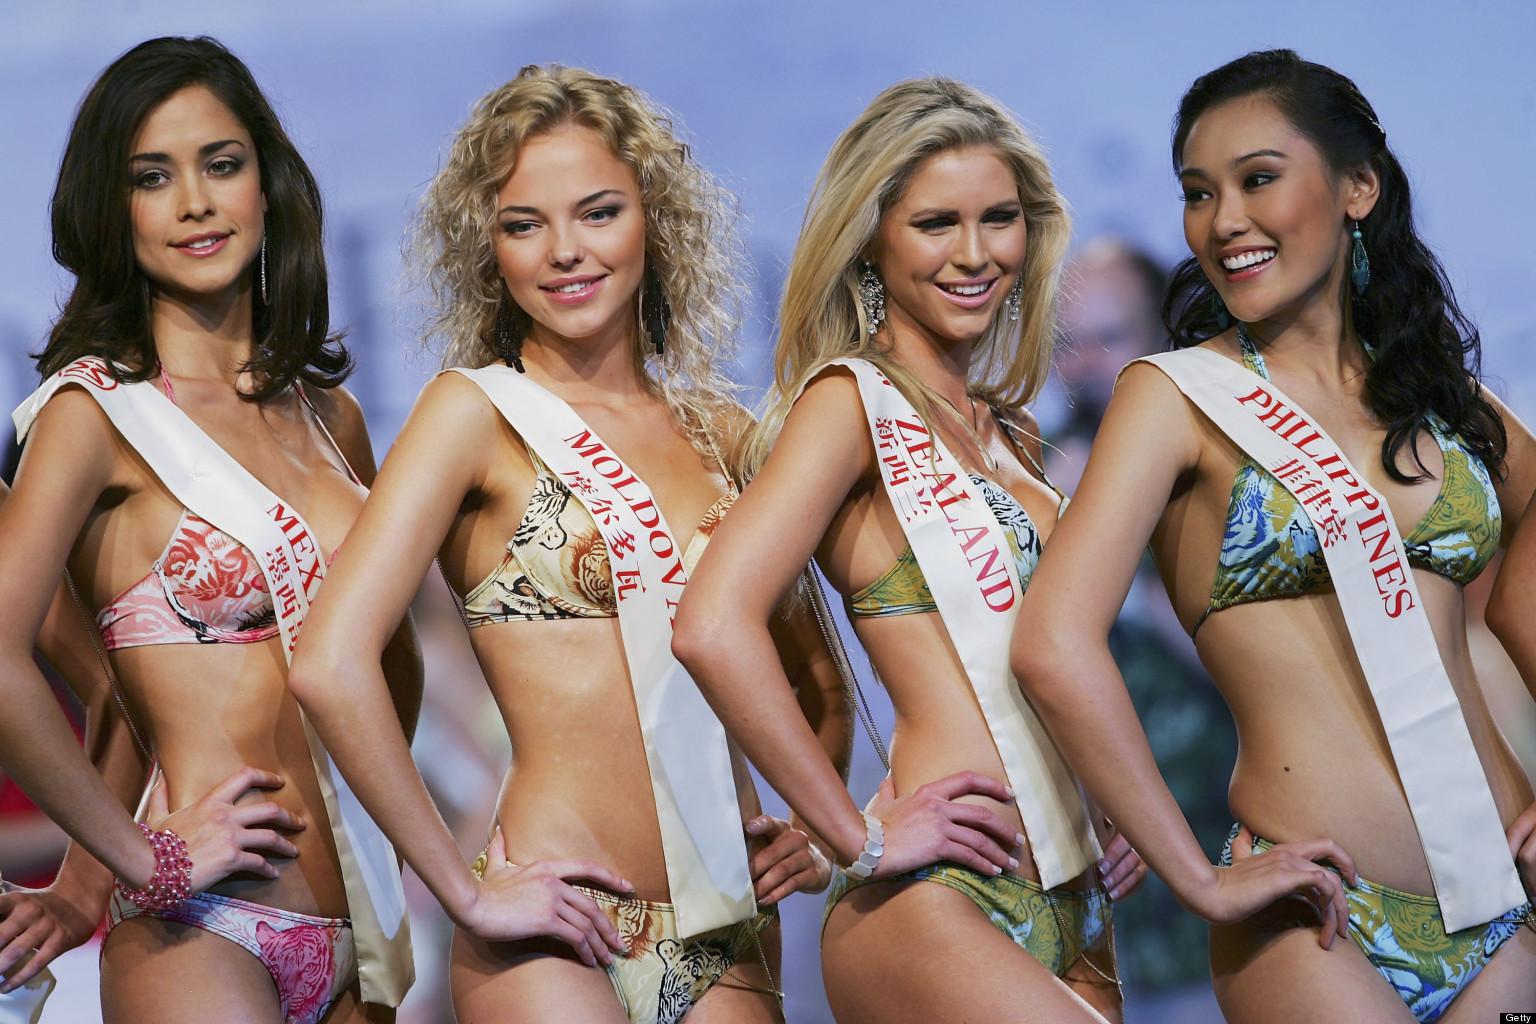 Ms bikini world contest charming answer